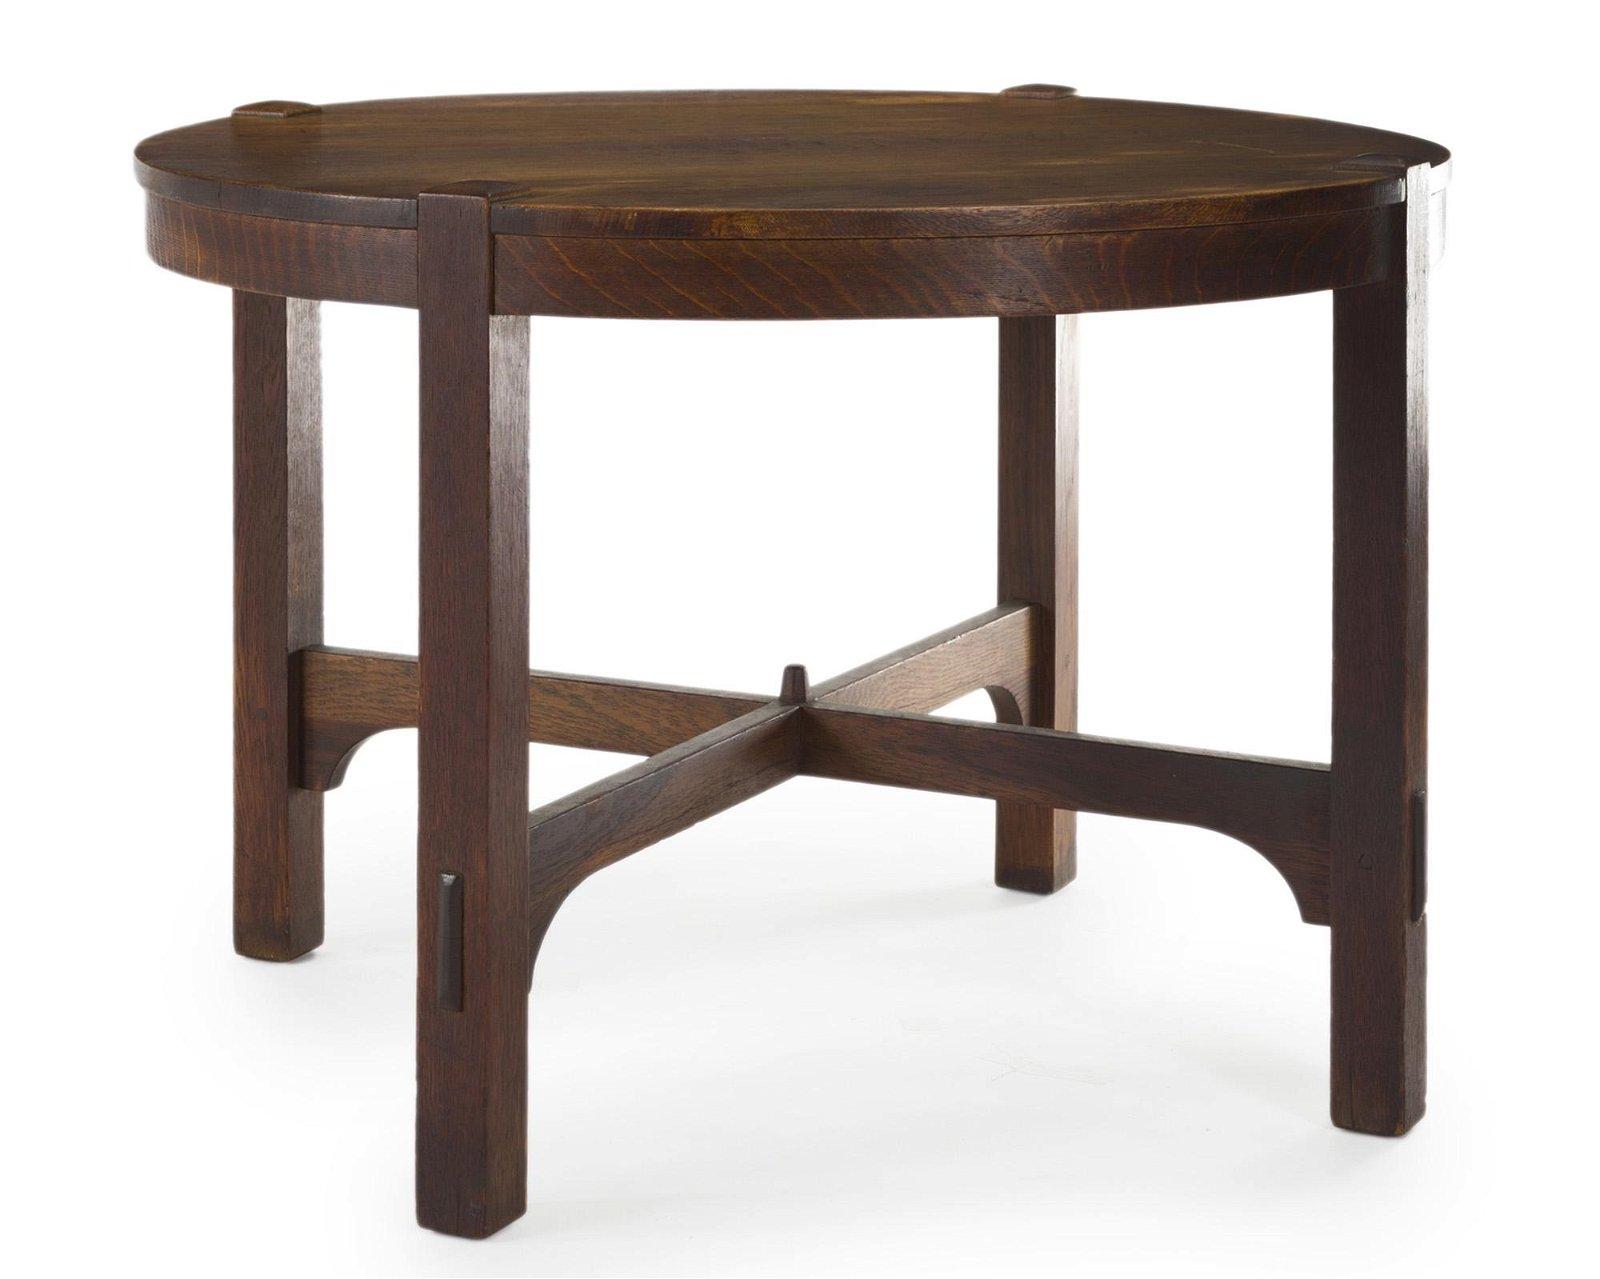 A Gustav Stickley oak table, No. 626